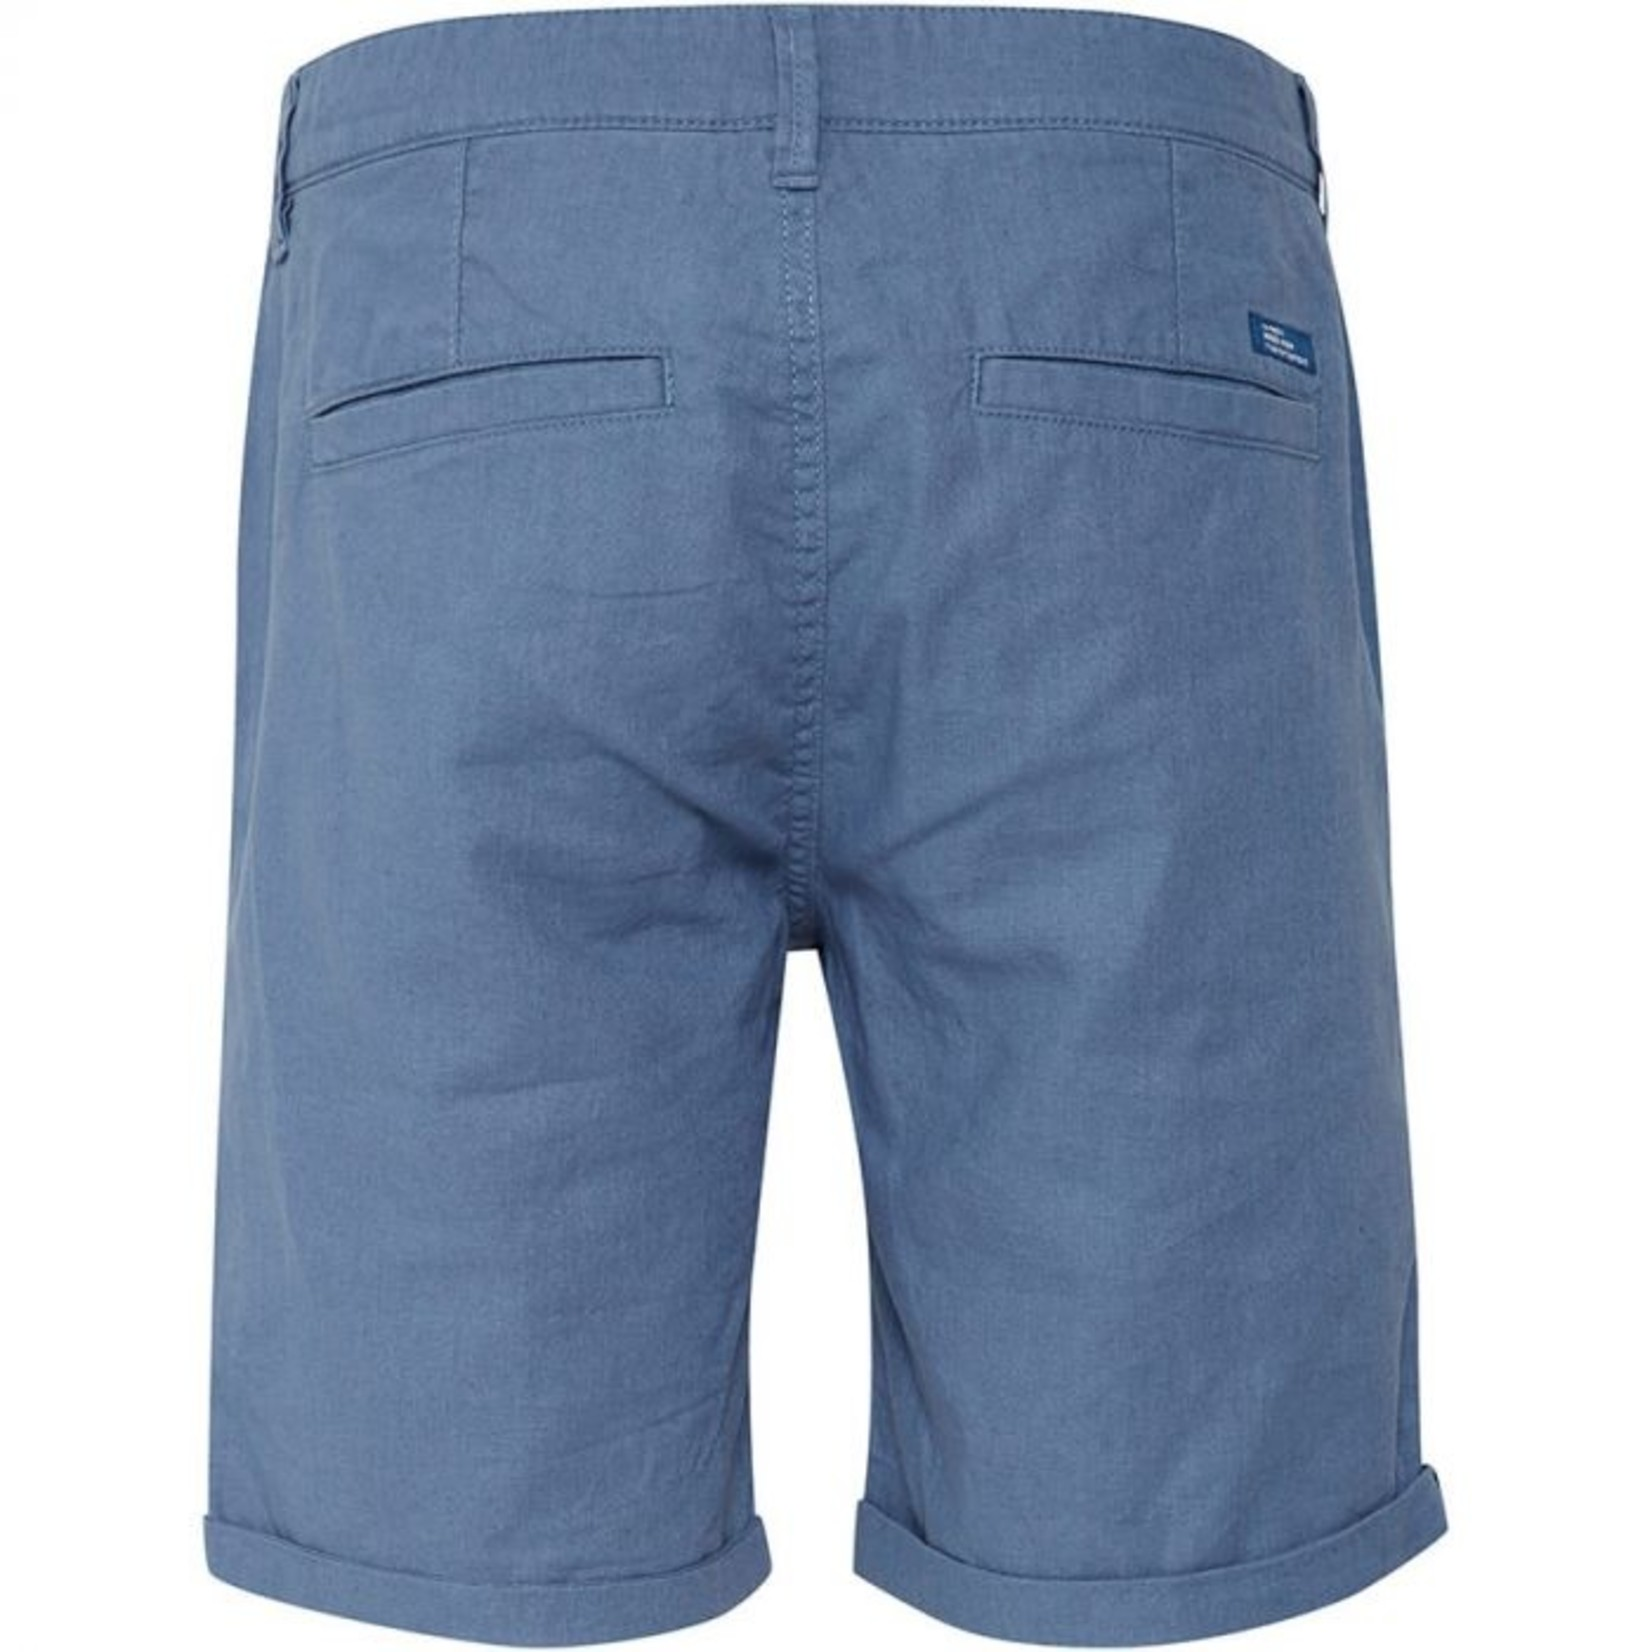 Blend Blend 20712189 Blue Linen/ Cotton Shorts